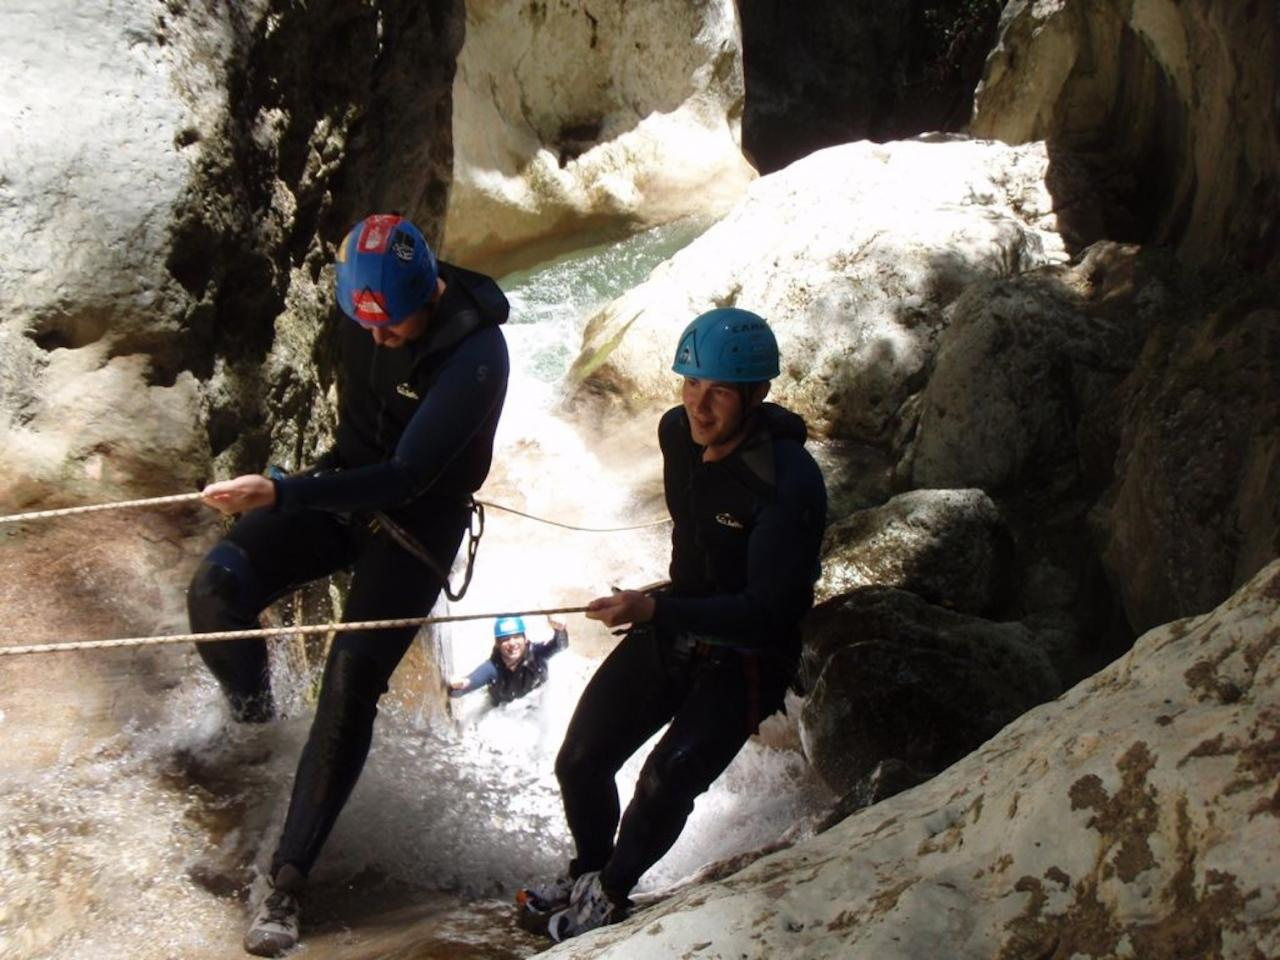 Mountain climbing in Torrent de Coanegra with Guid Hendirk Uhlemann.